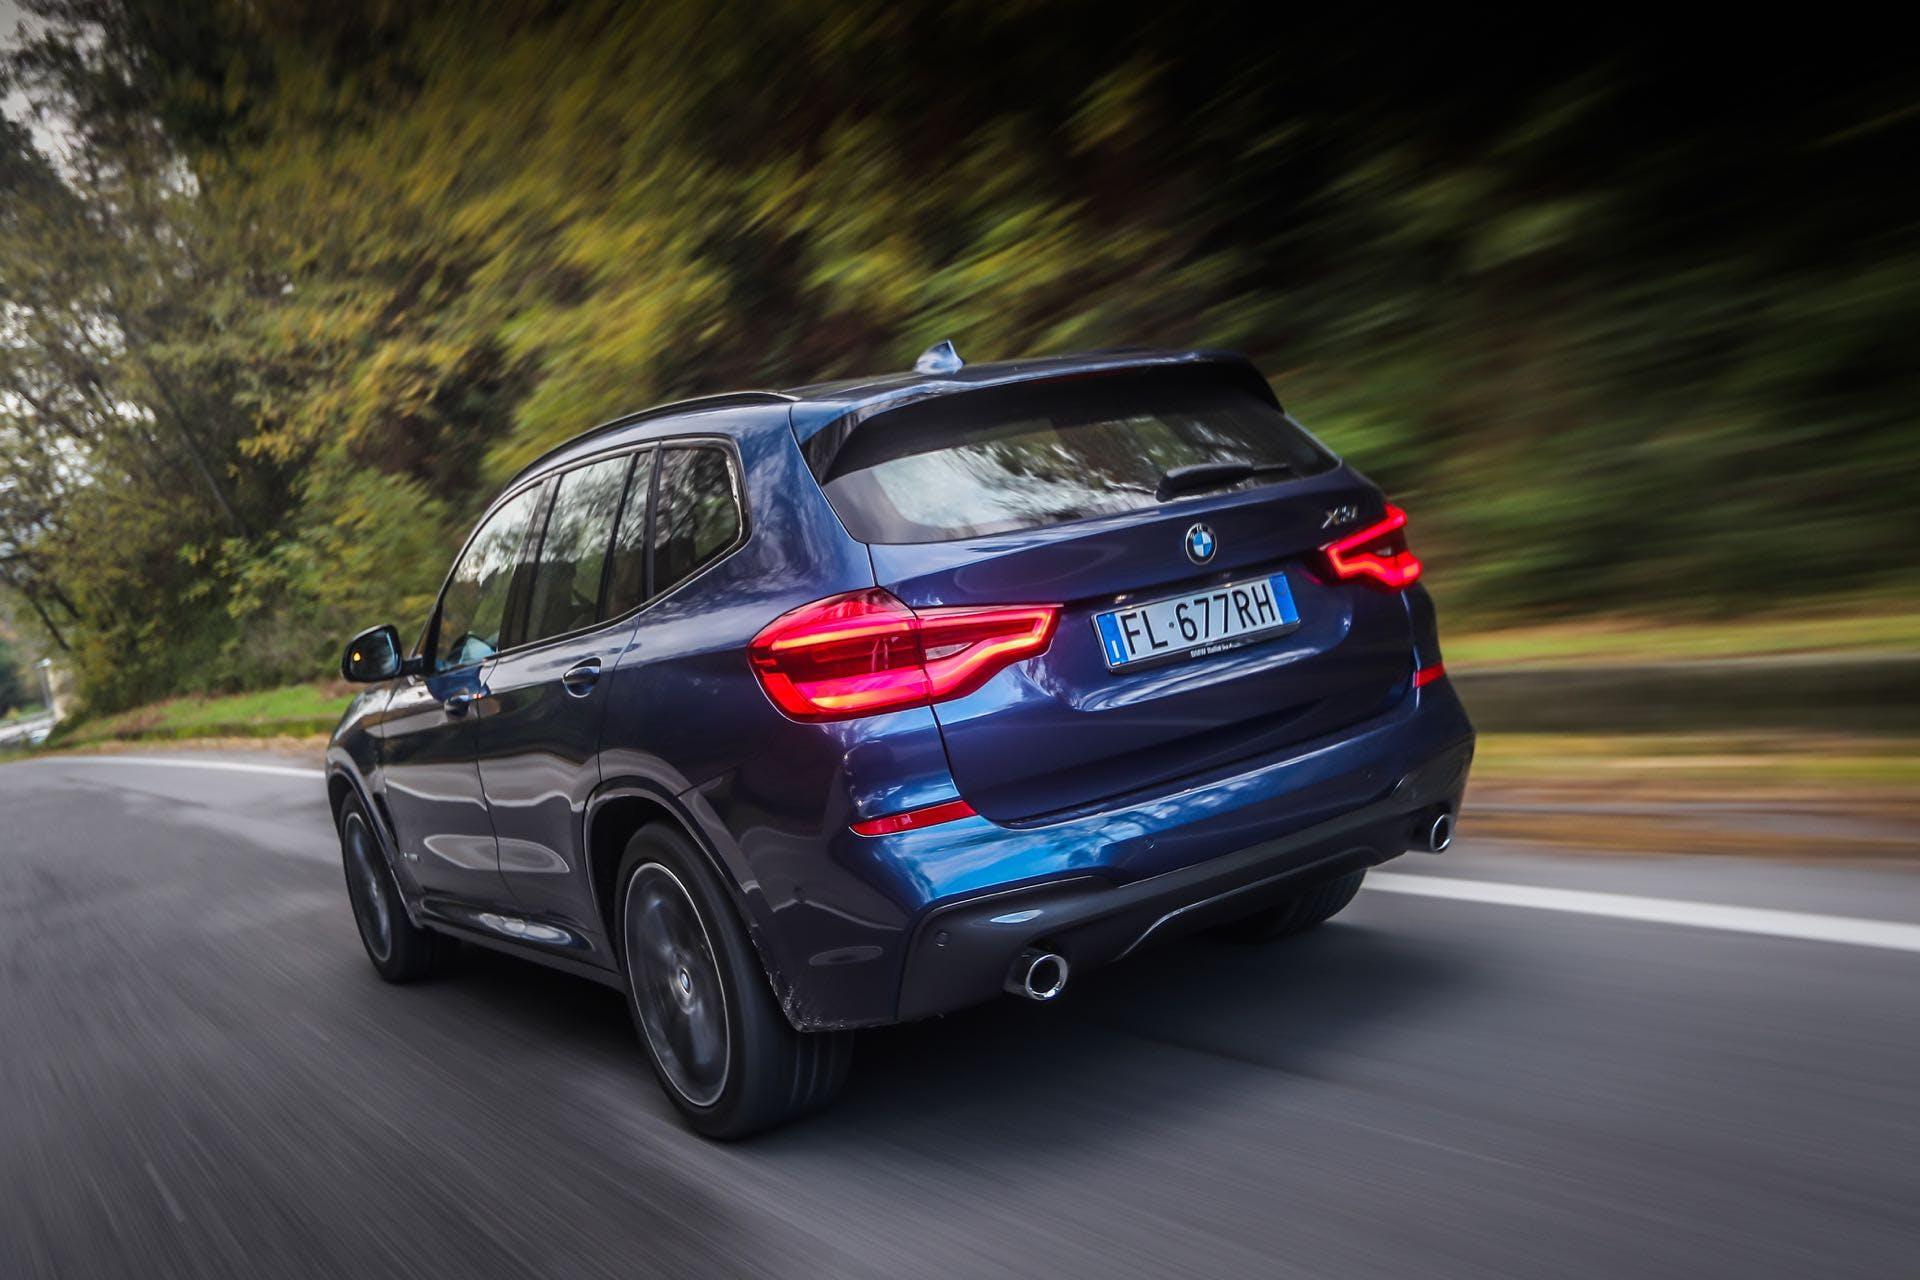 BMW X3 color blu guidata su strada vista da dietro